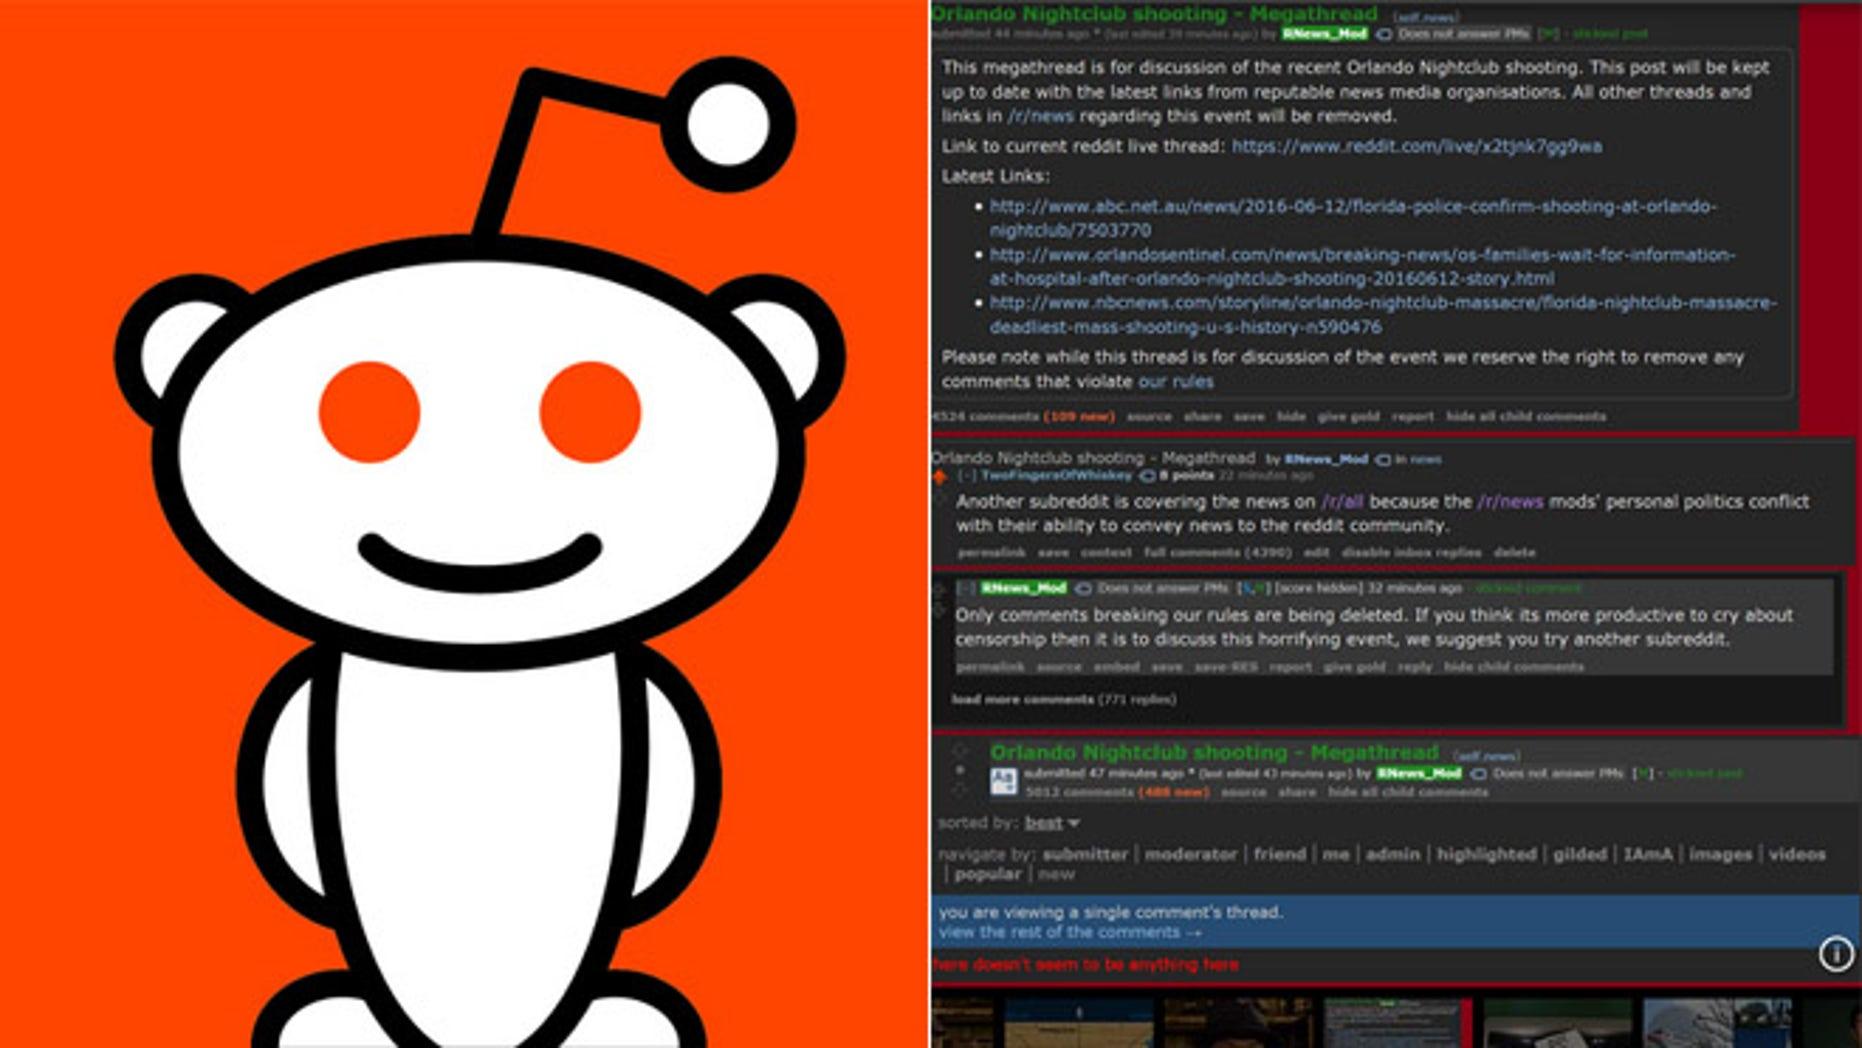 (Screenshot from www.reddit.com)